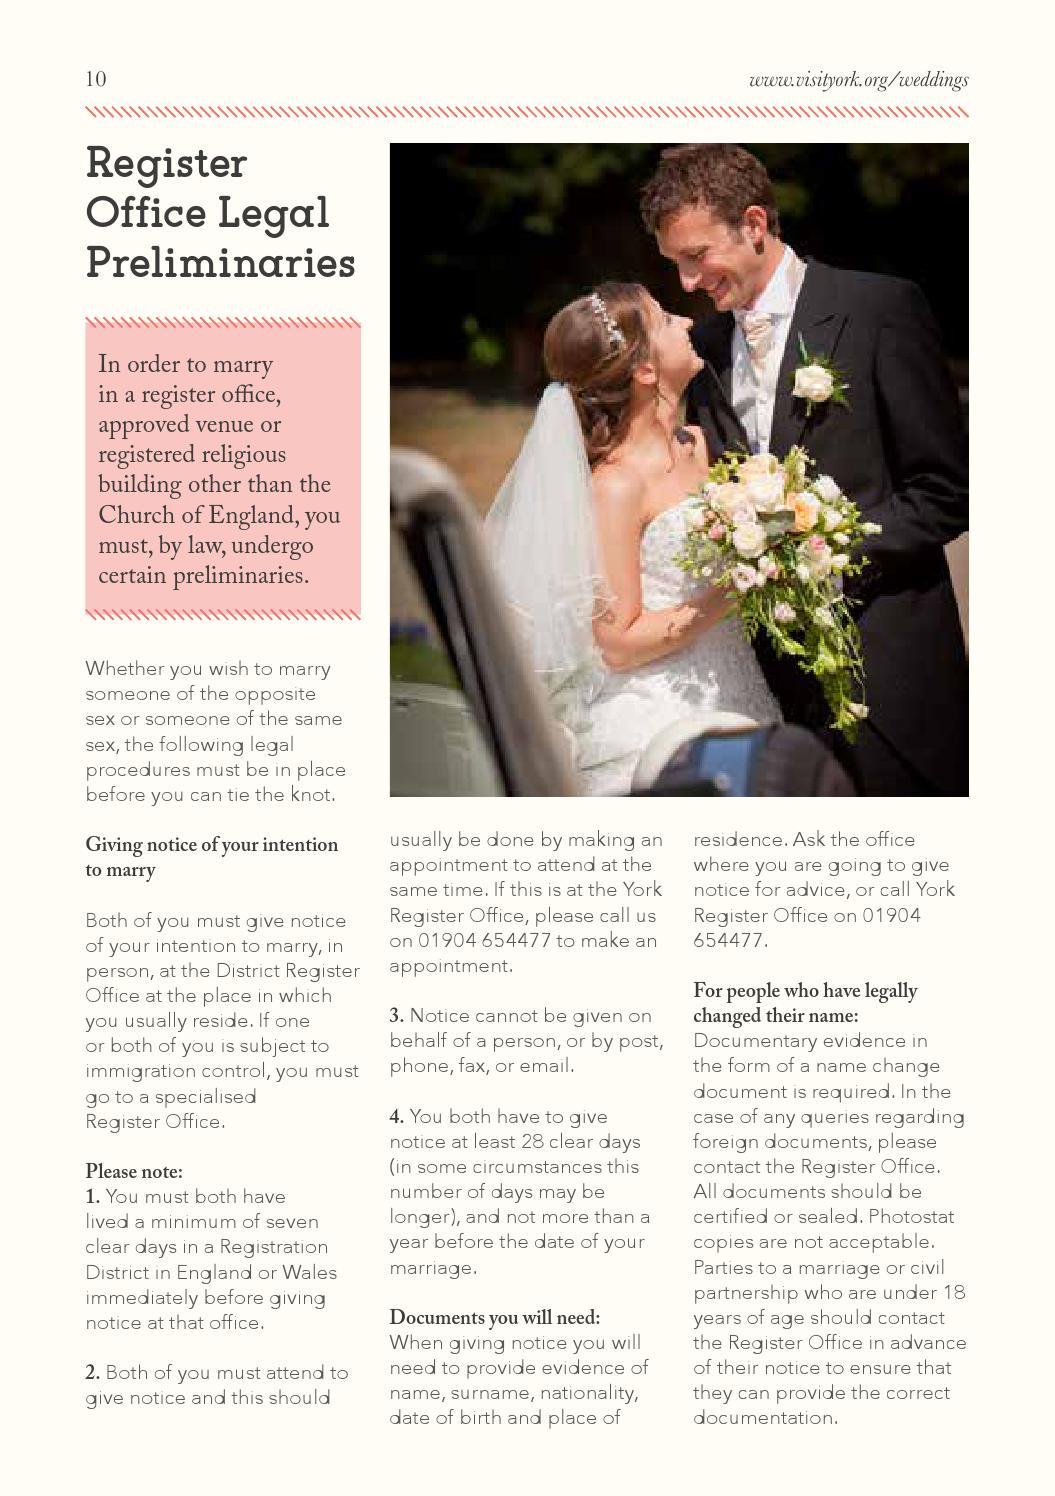 York Wedding Guide 2016/17 by Visit York - issuu